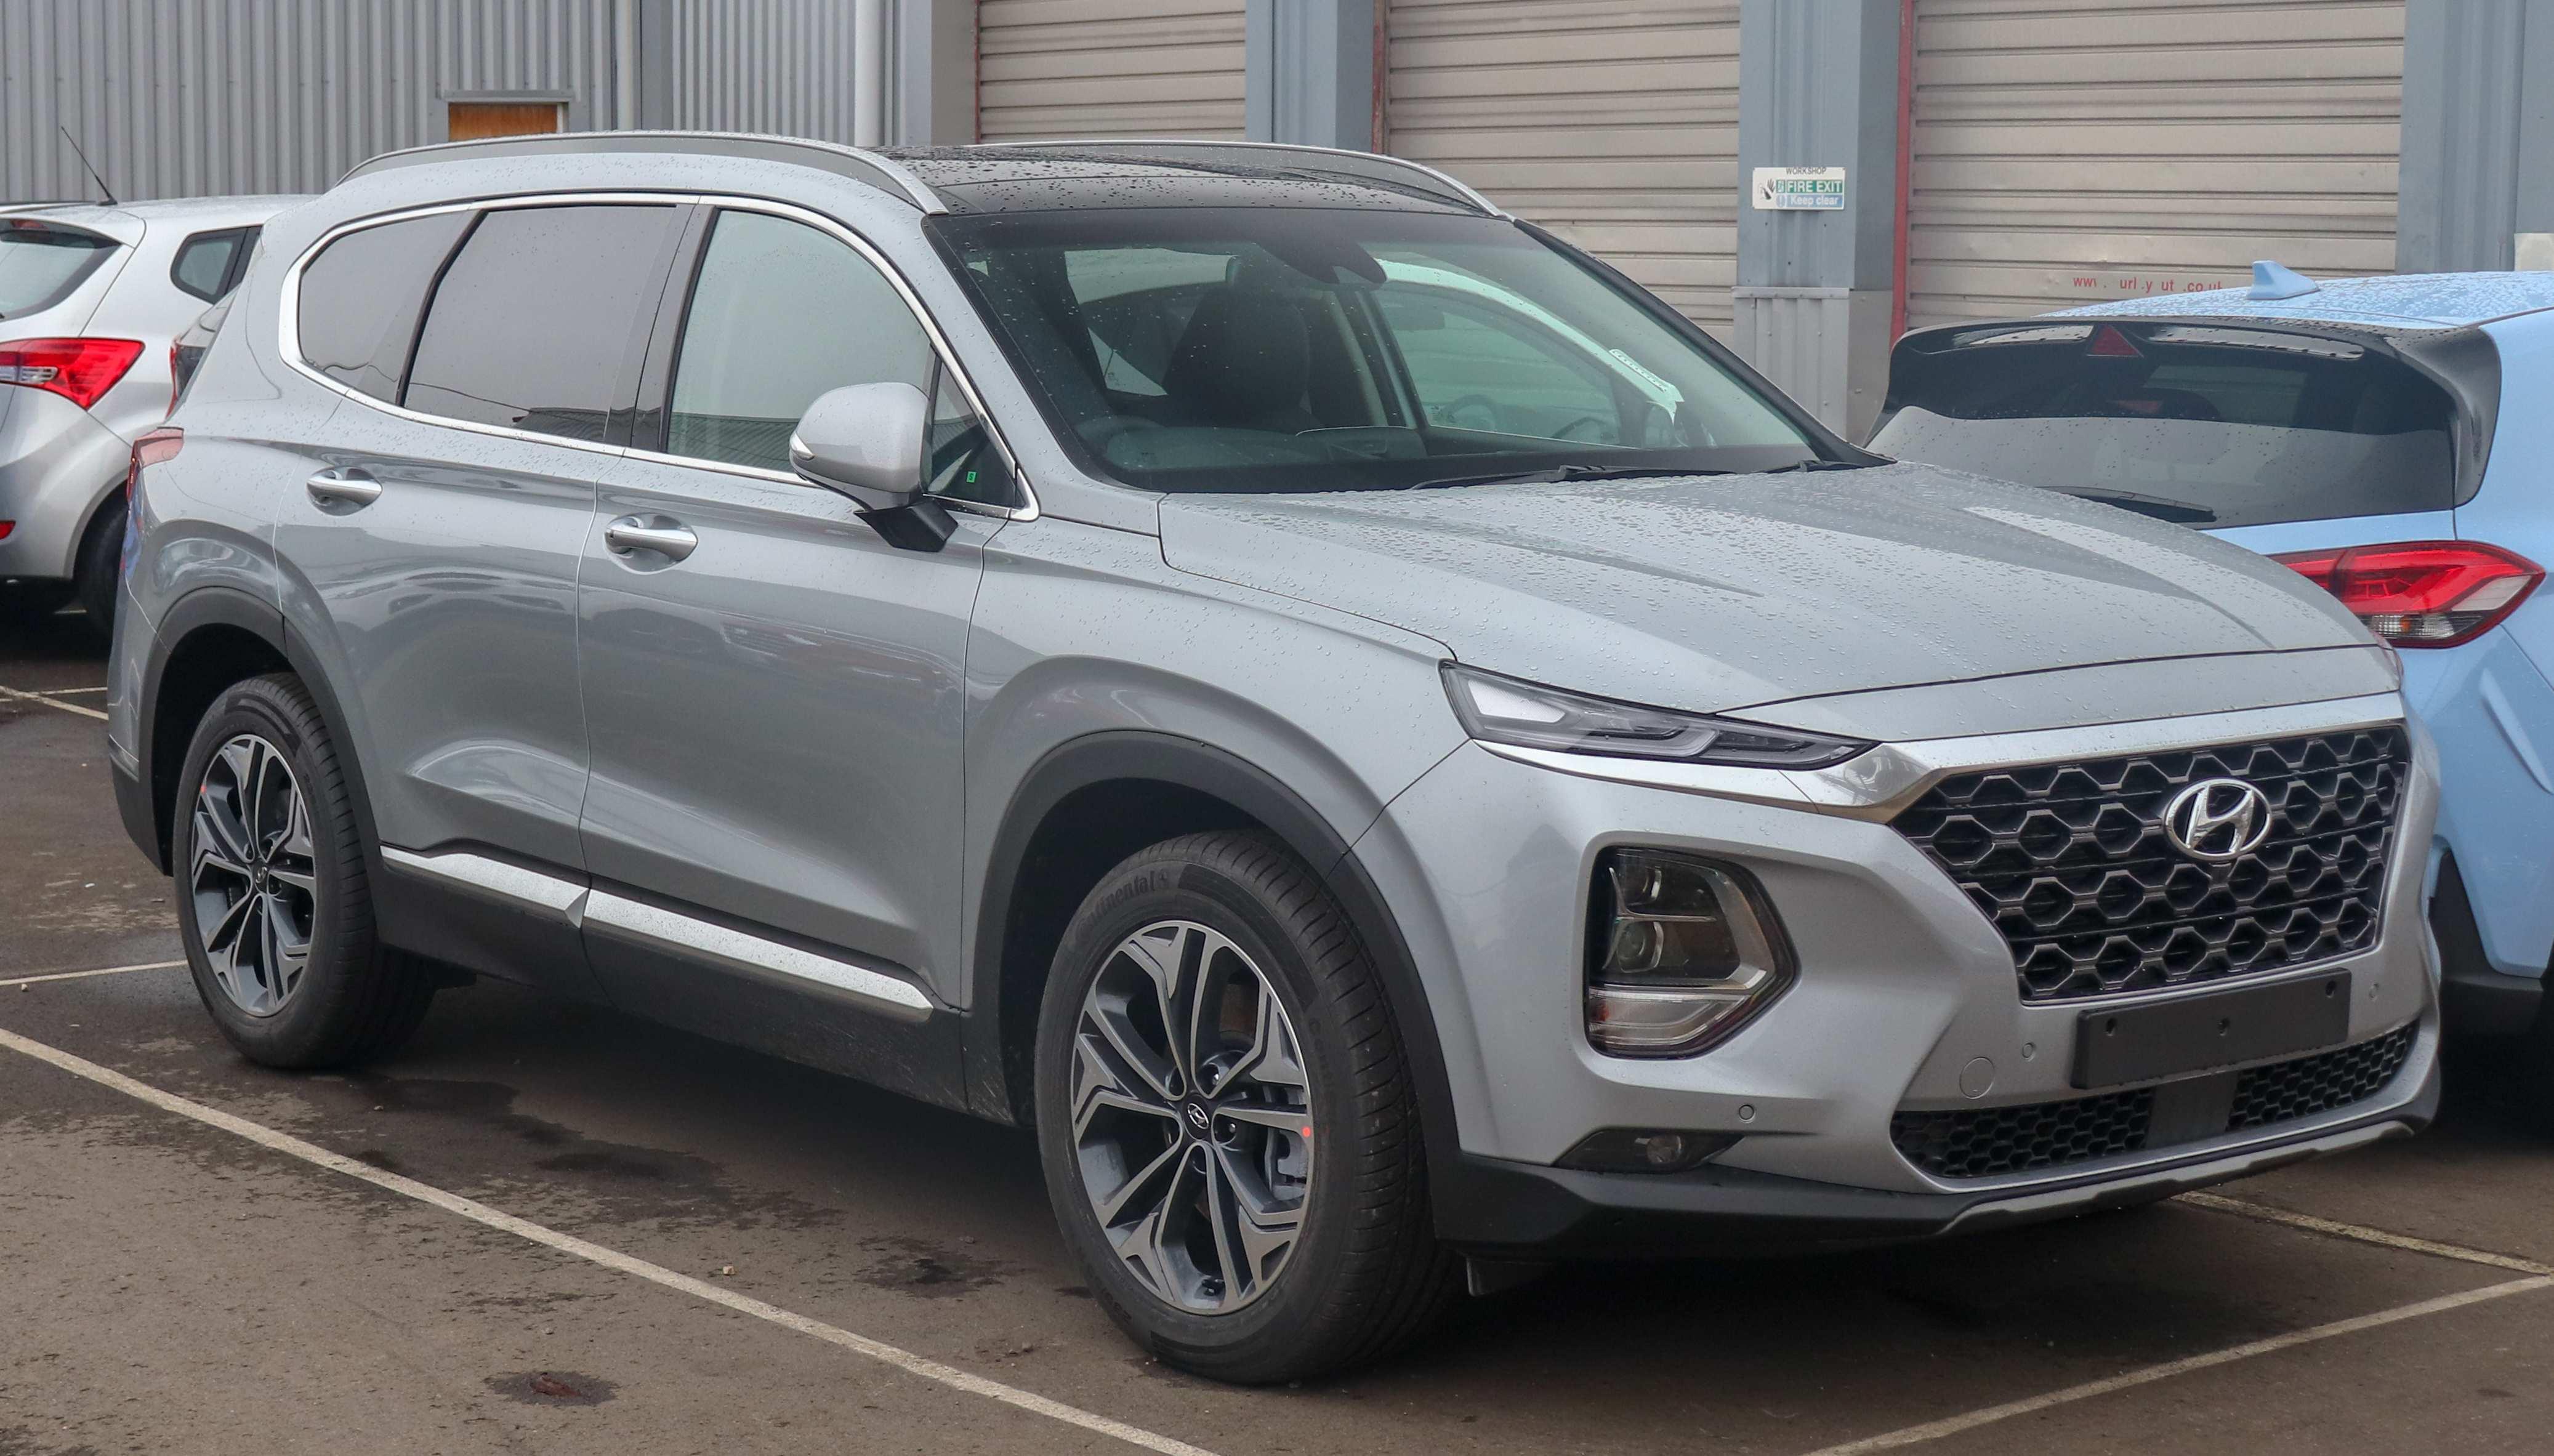 13 New 2019 Hyundai Santa Fe Pickup Configurations for 2019 Hyundai Santa Fe Pickup